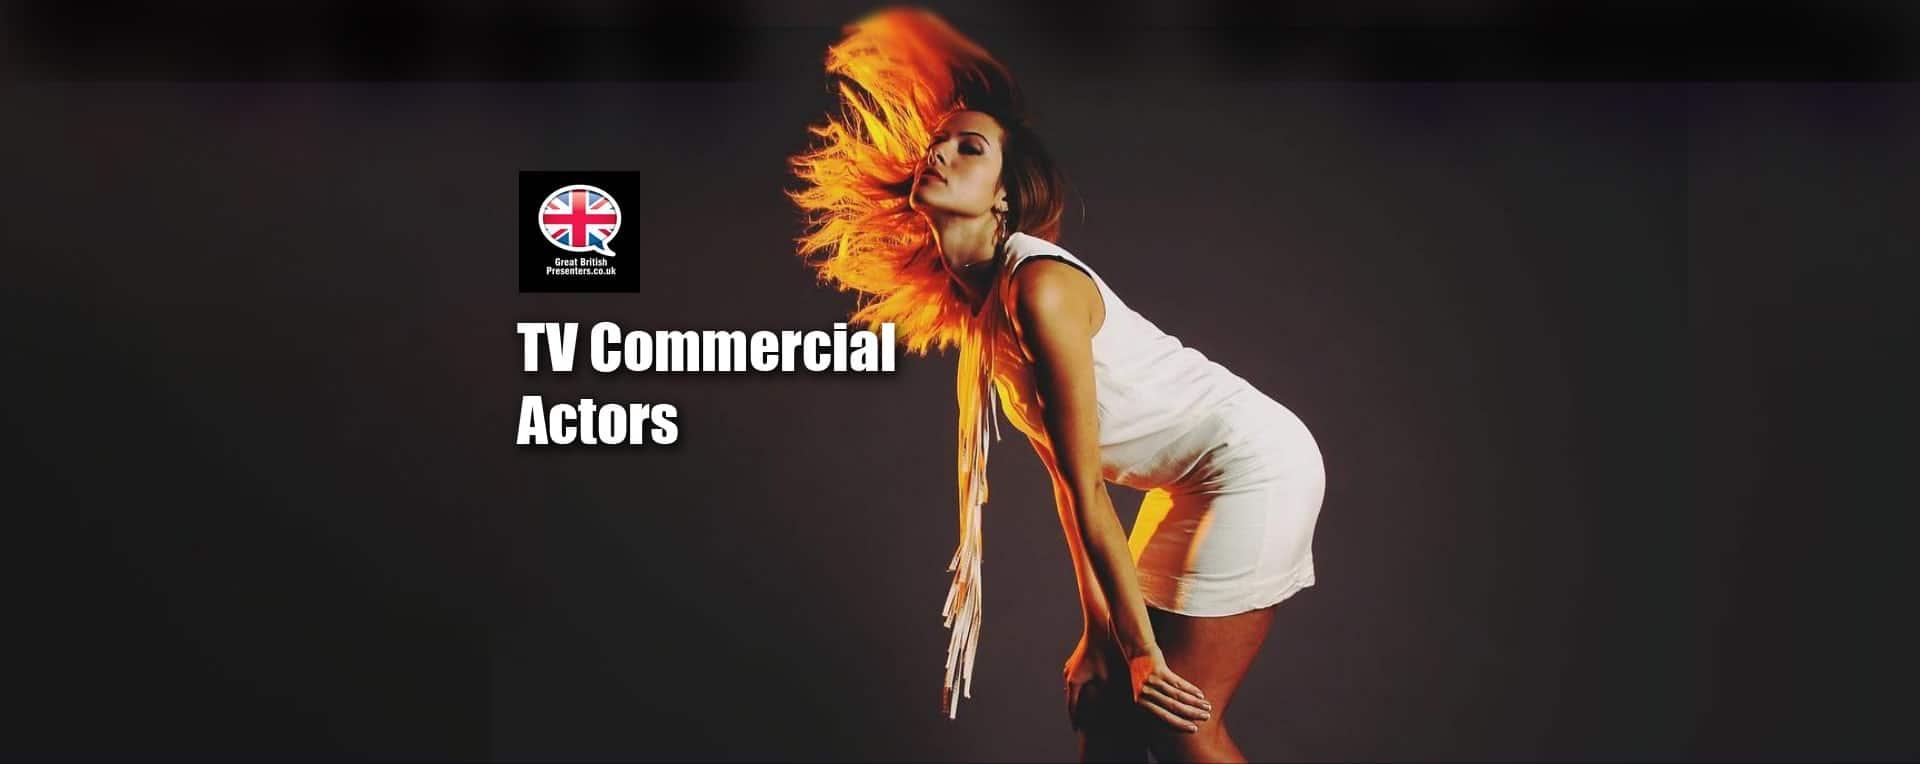 TV Commercial Actors models Youtube presenters Social Media video product demonstrators at Great british Presenters-min